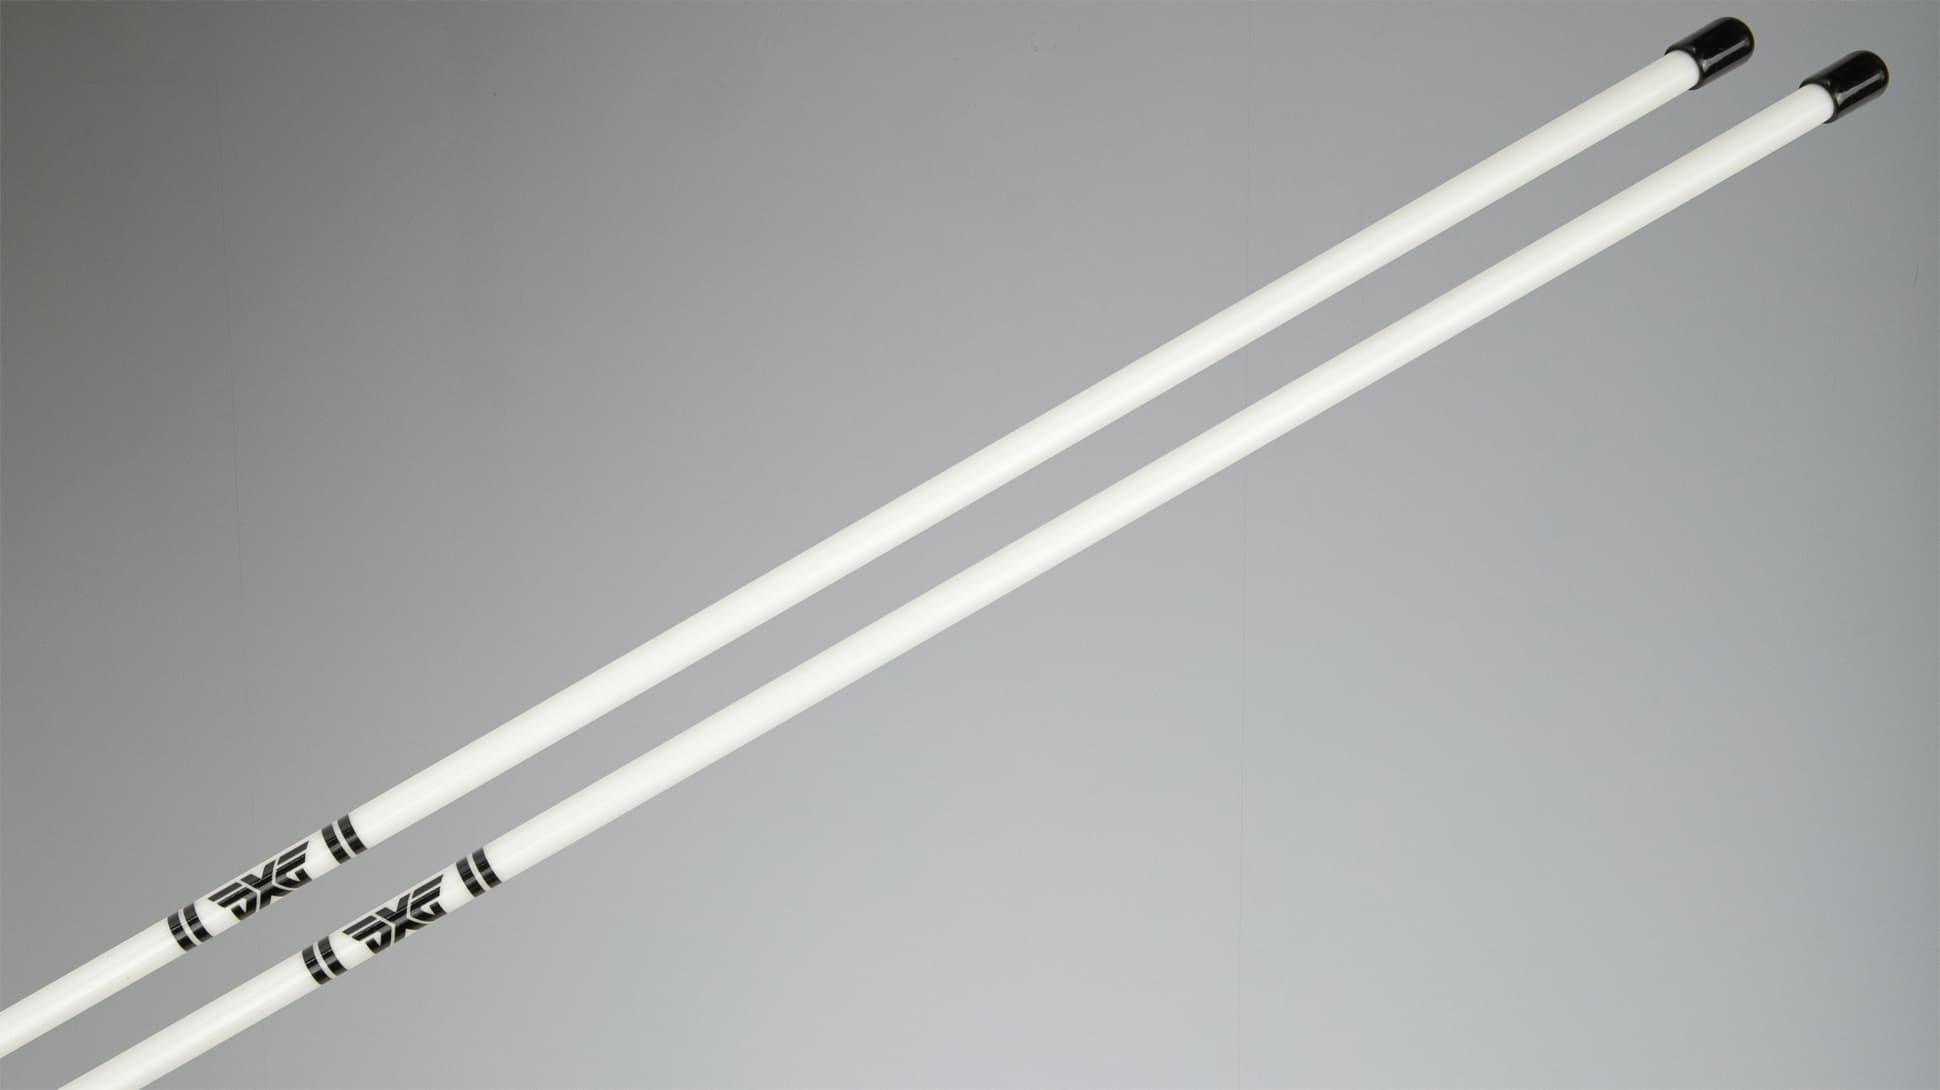 PXG Players Alignment Sticks Image 2